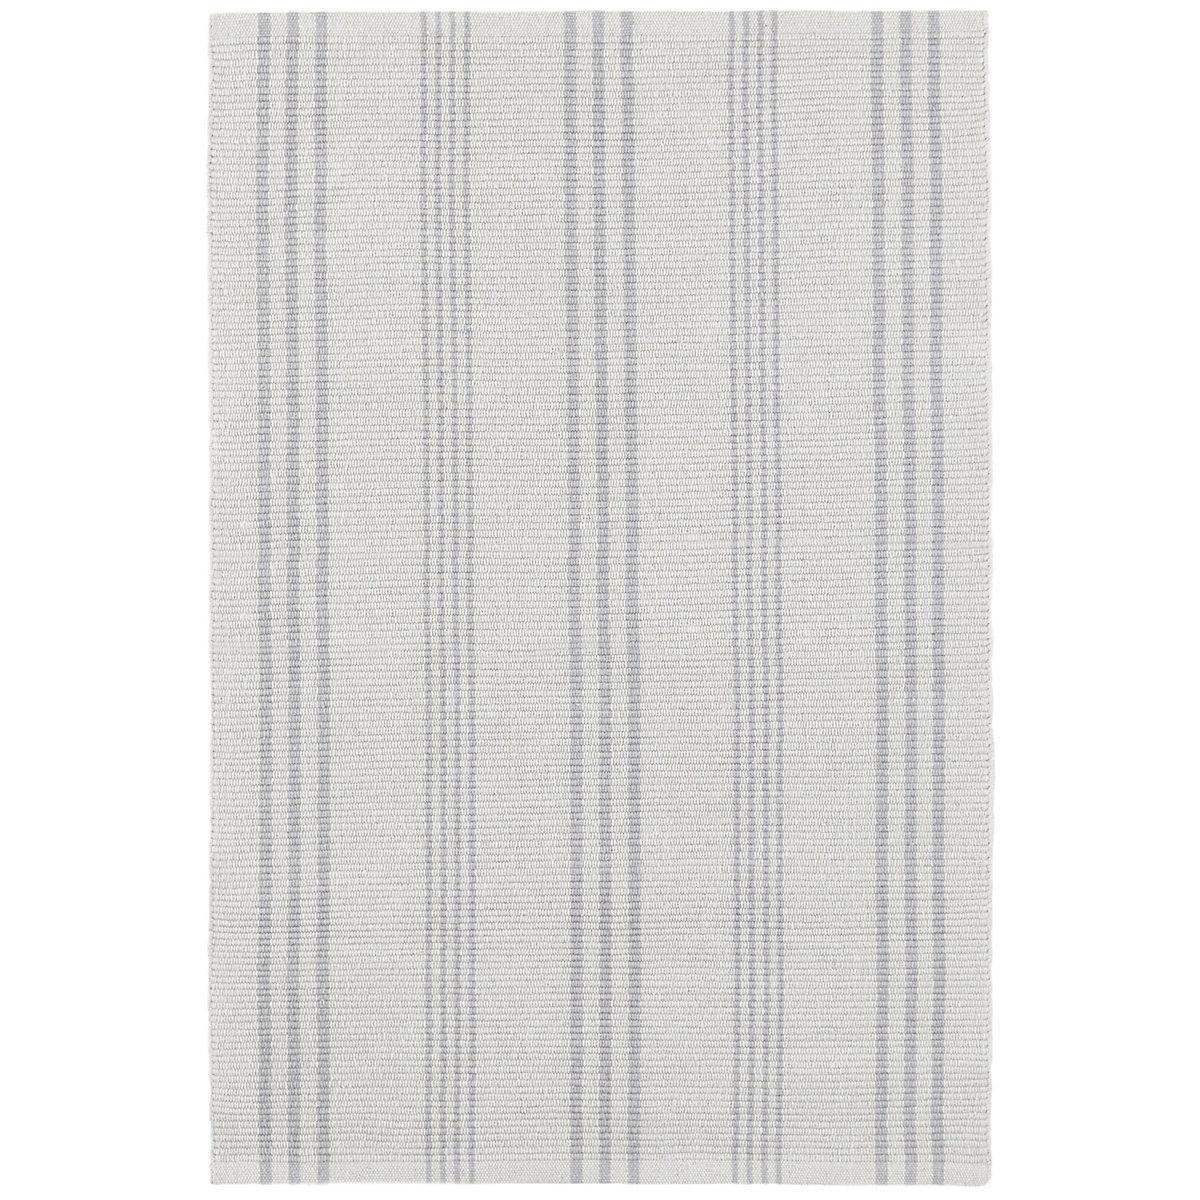 Aland Stripe Cotton Woven Rug Dash Amp Albert